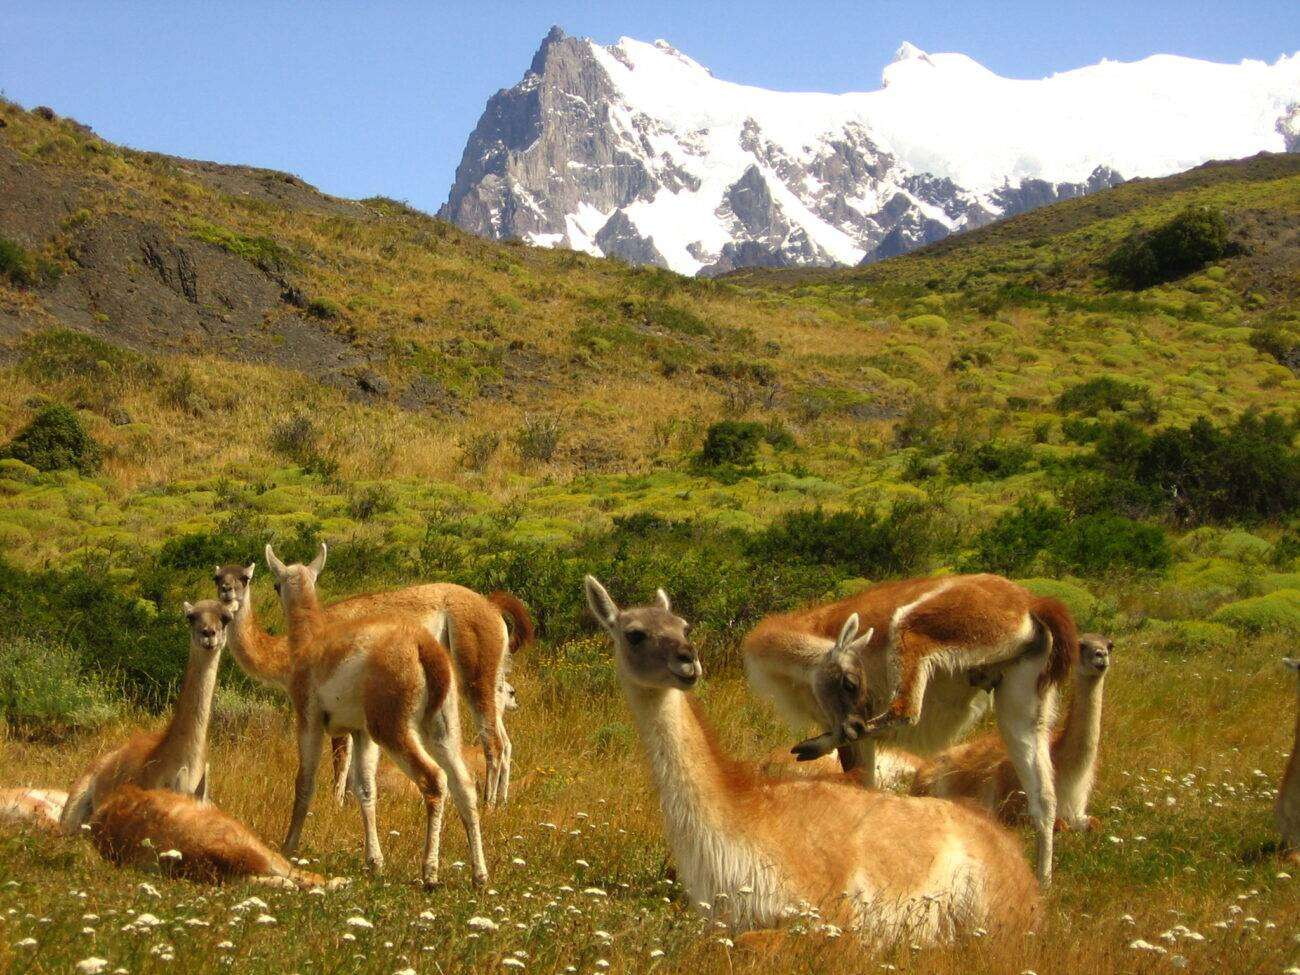 IMG 0082 scaled Viaggio in PATAGONIA Grand Tour completo tra Argentina e Cile sino a Ushuaia